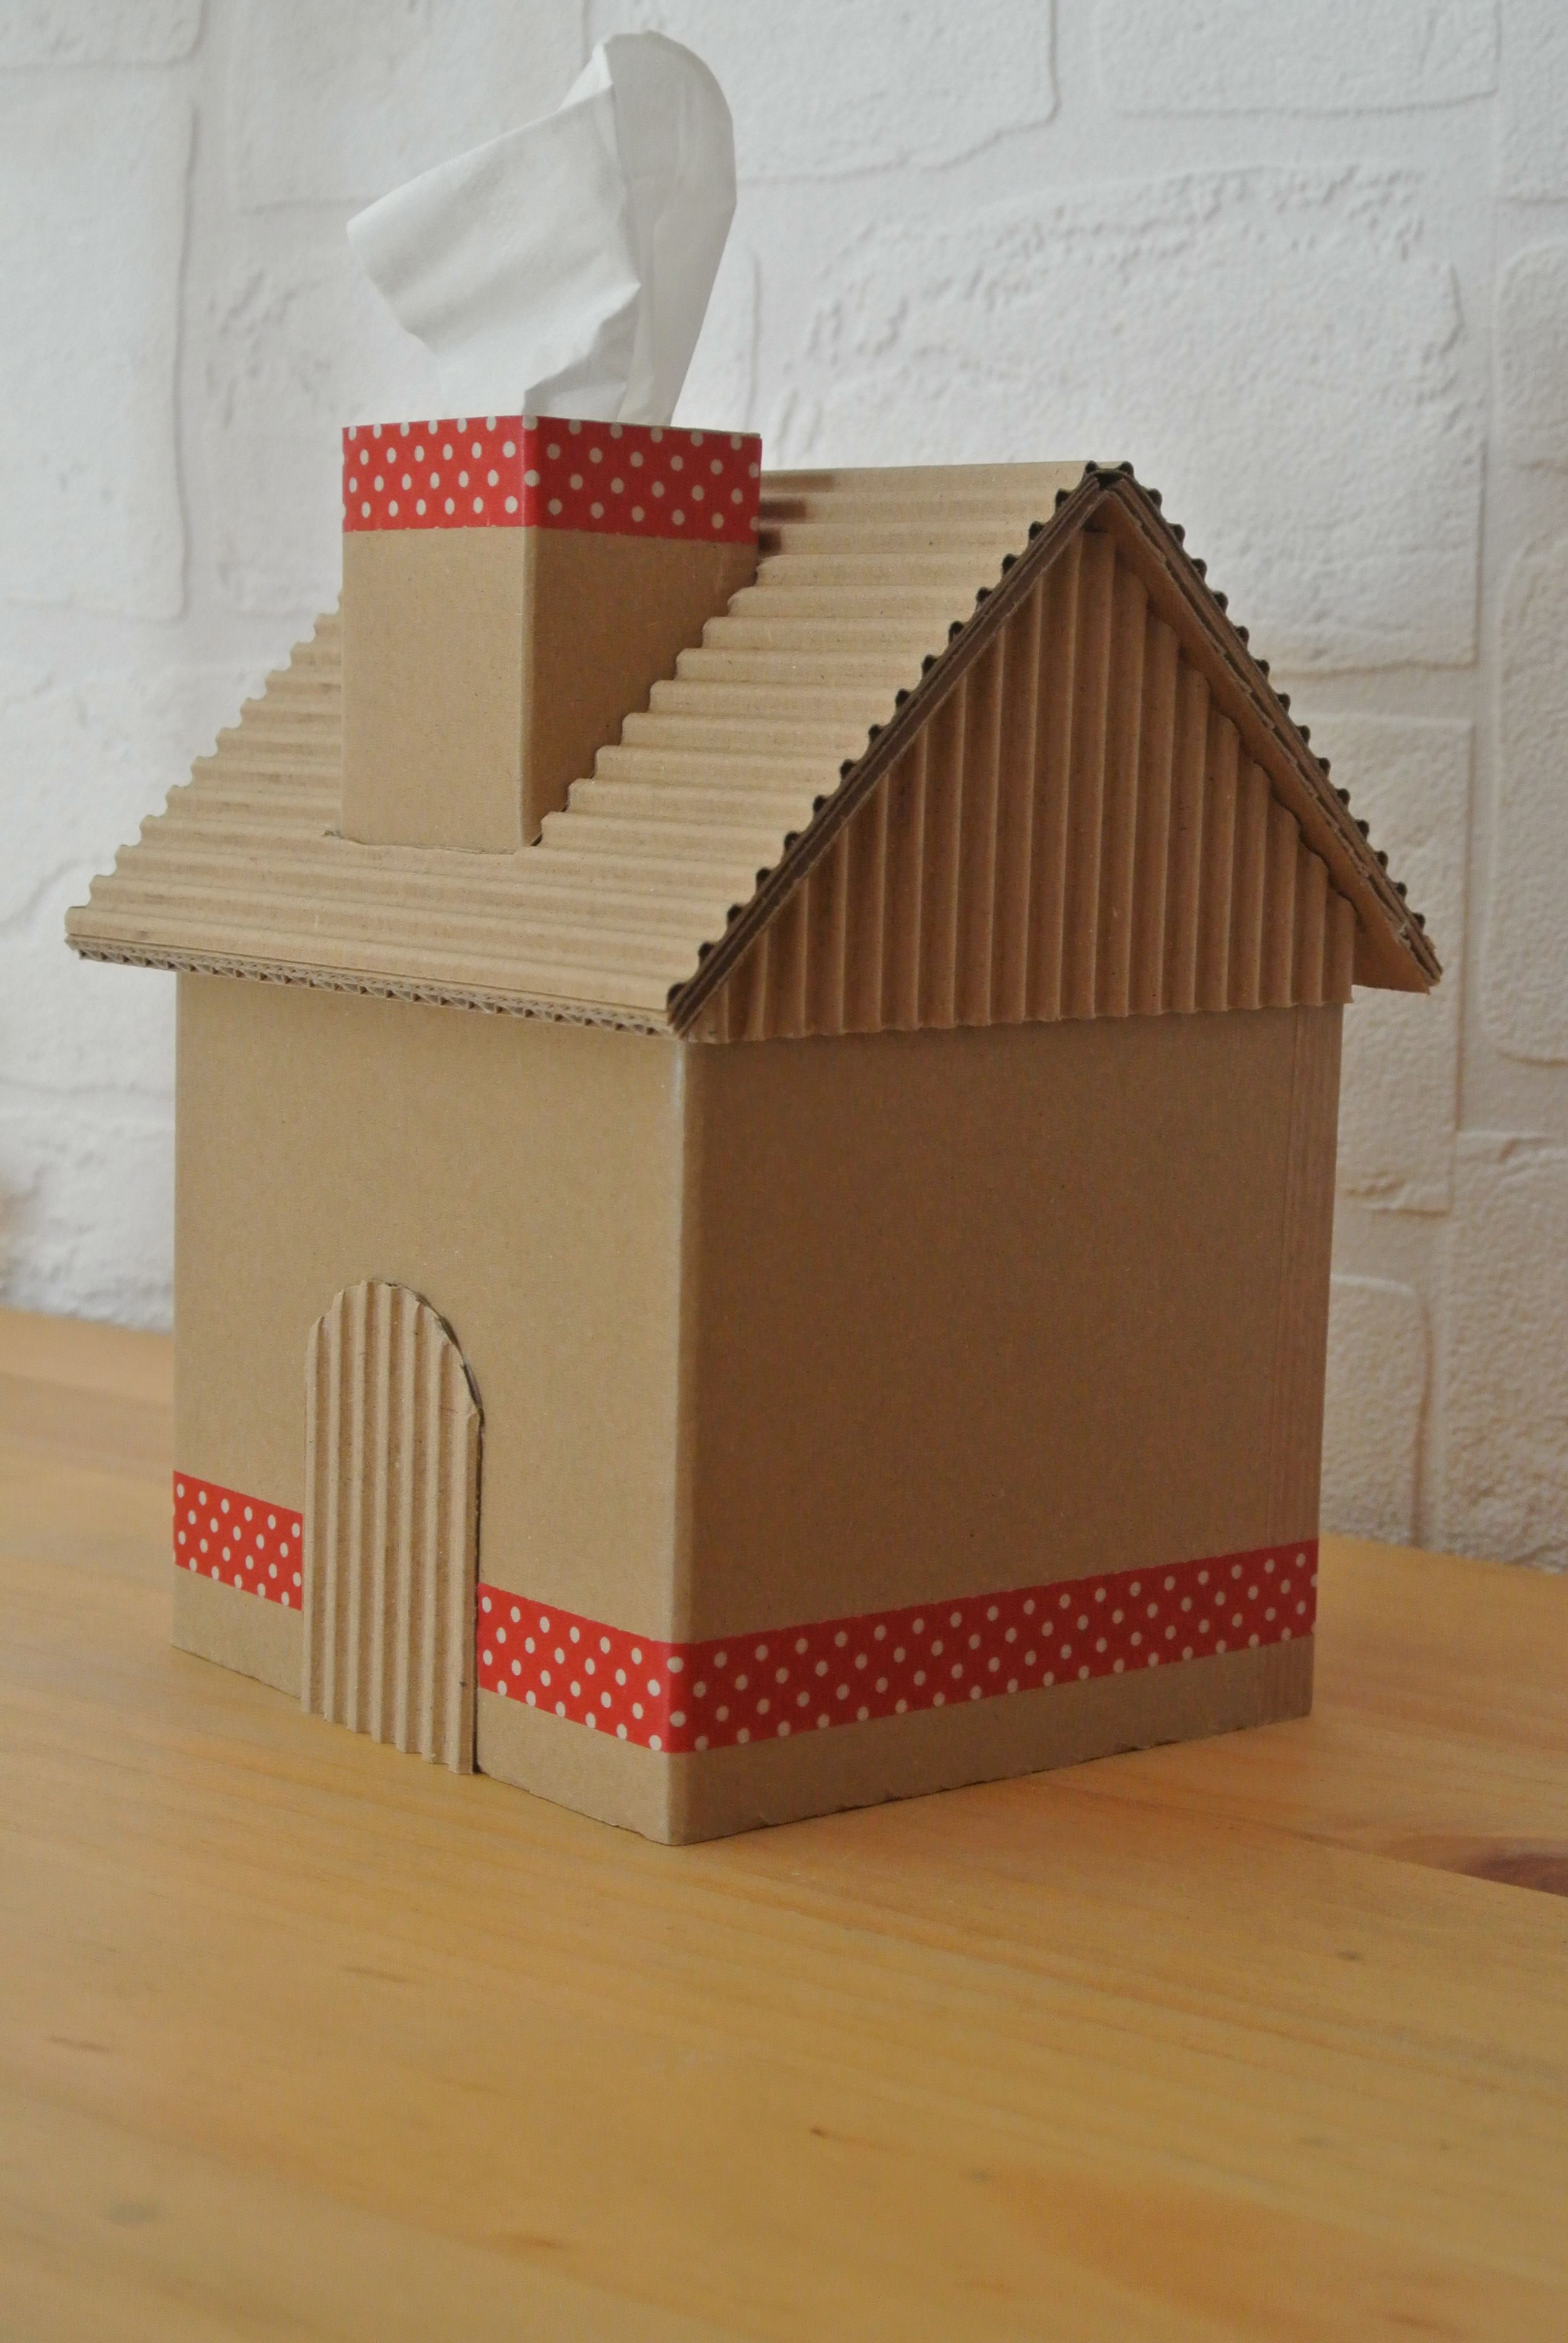 boite mouchoirs maison carton ondul pinterest cart n casas de cart n y. Black Bedroom Furniture Sets. Home Design Ideas